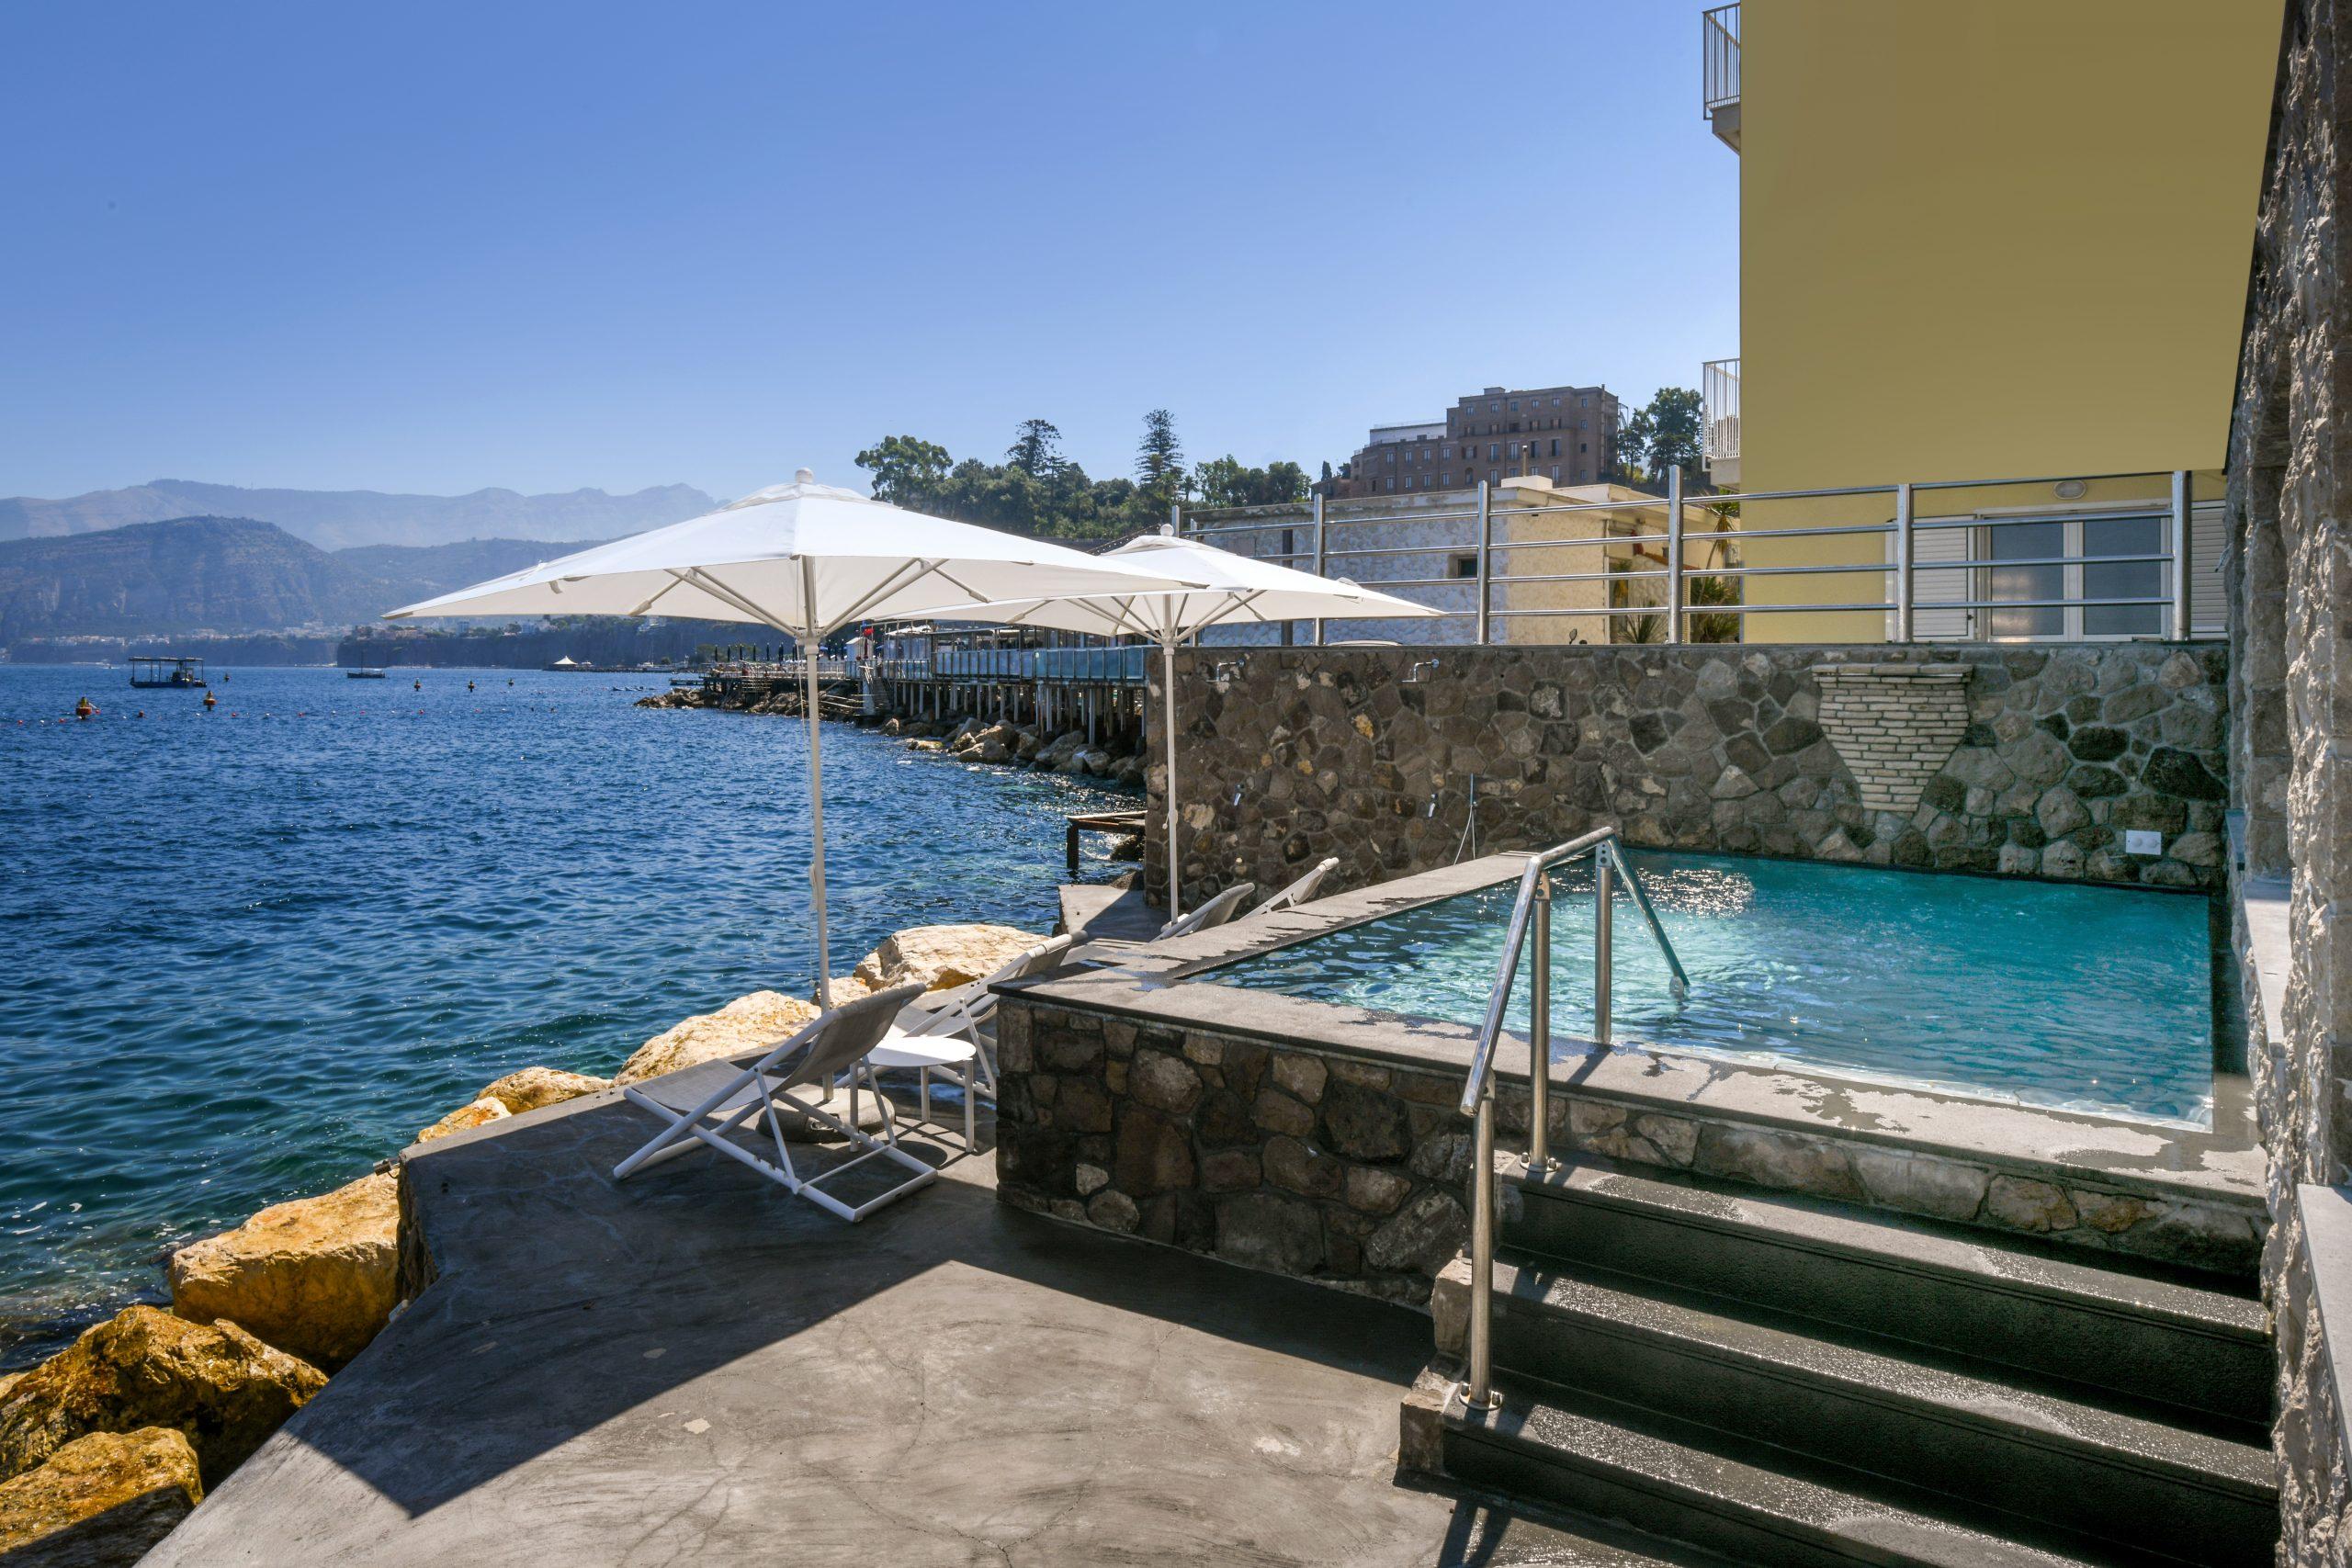 Villa Sorrento by the sea Pool